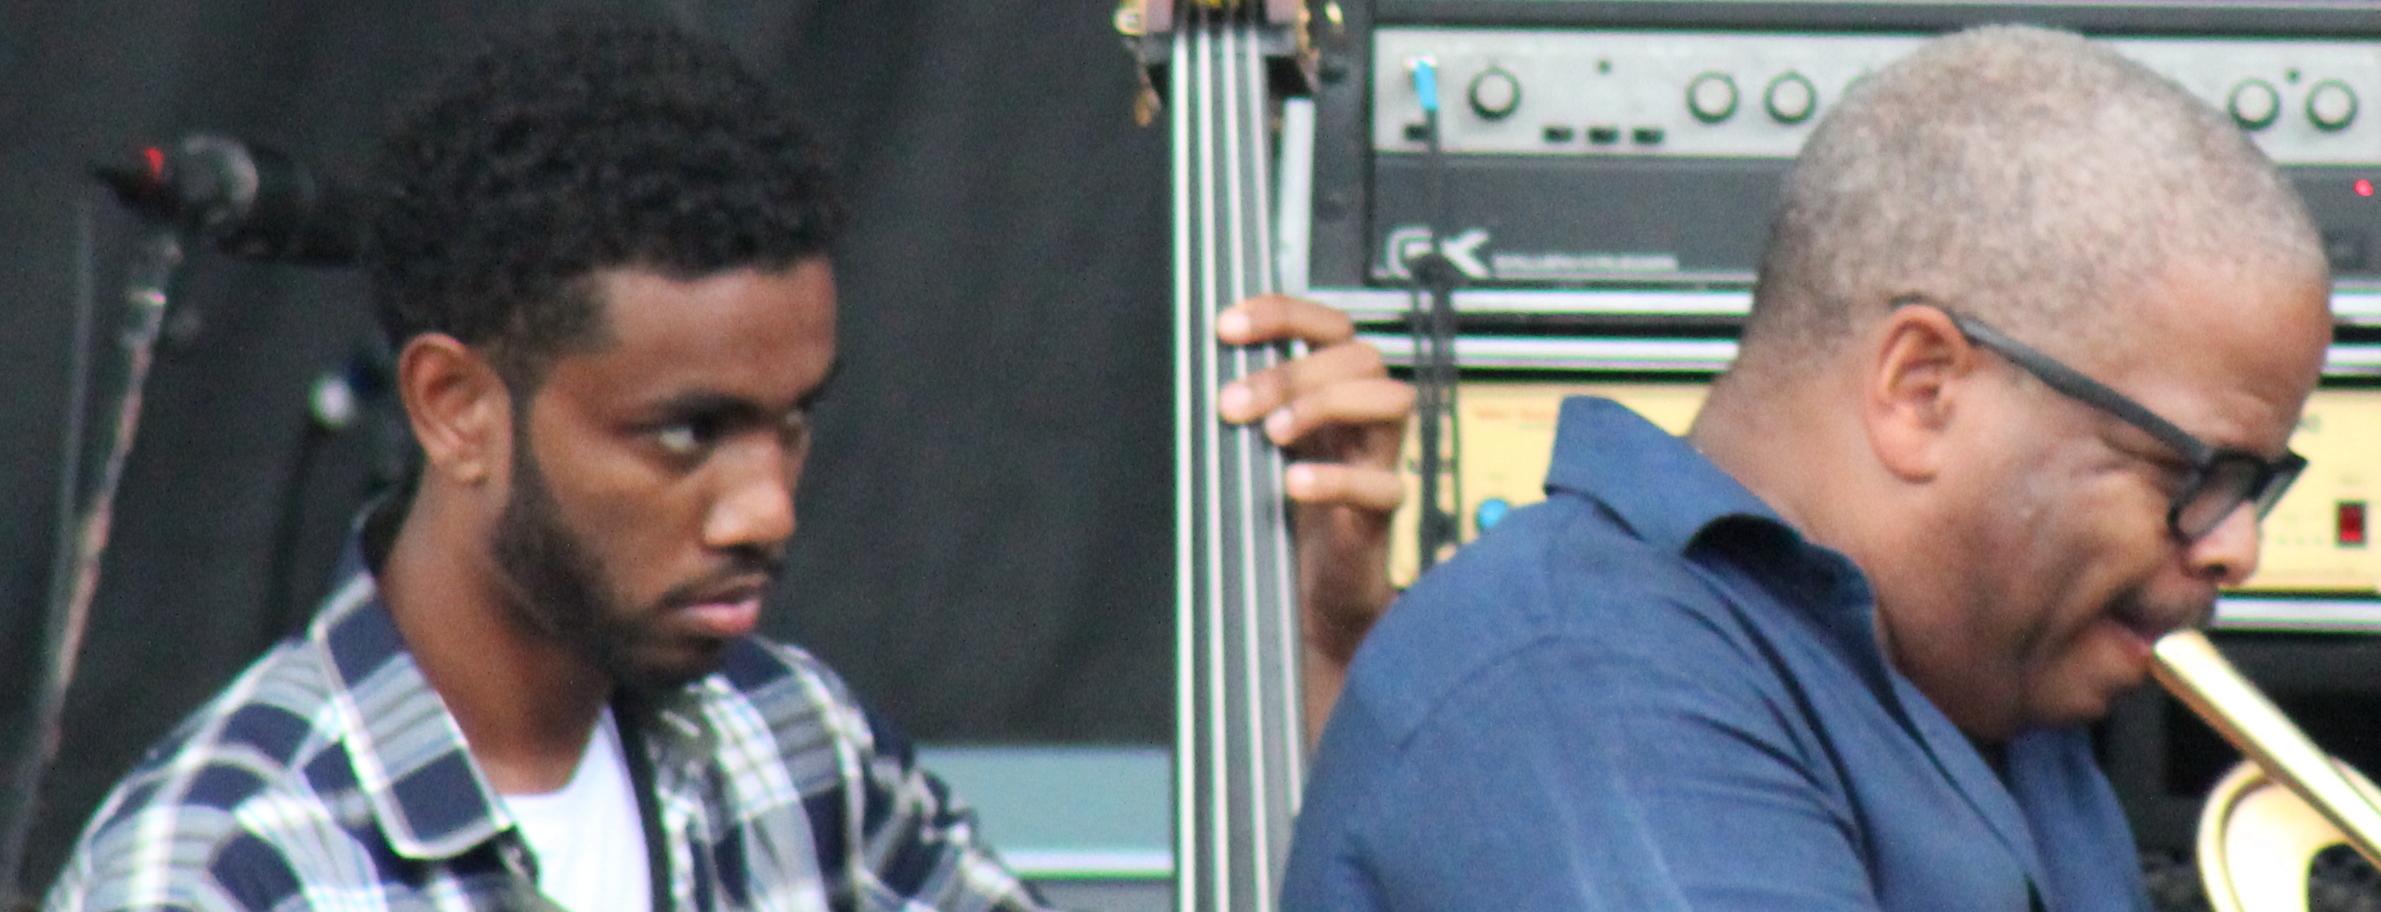 Richmond jazz fest at maymont park